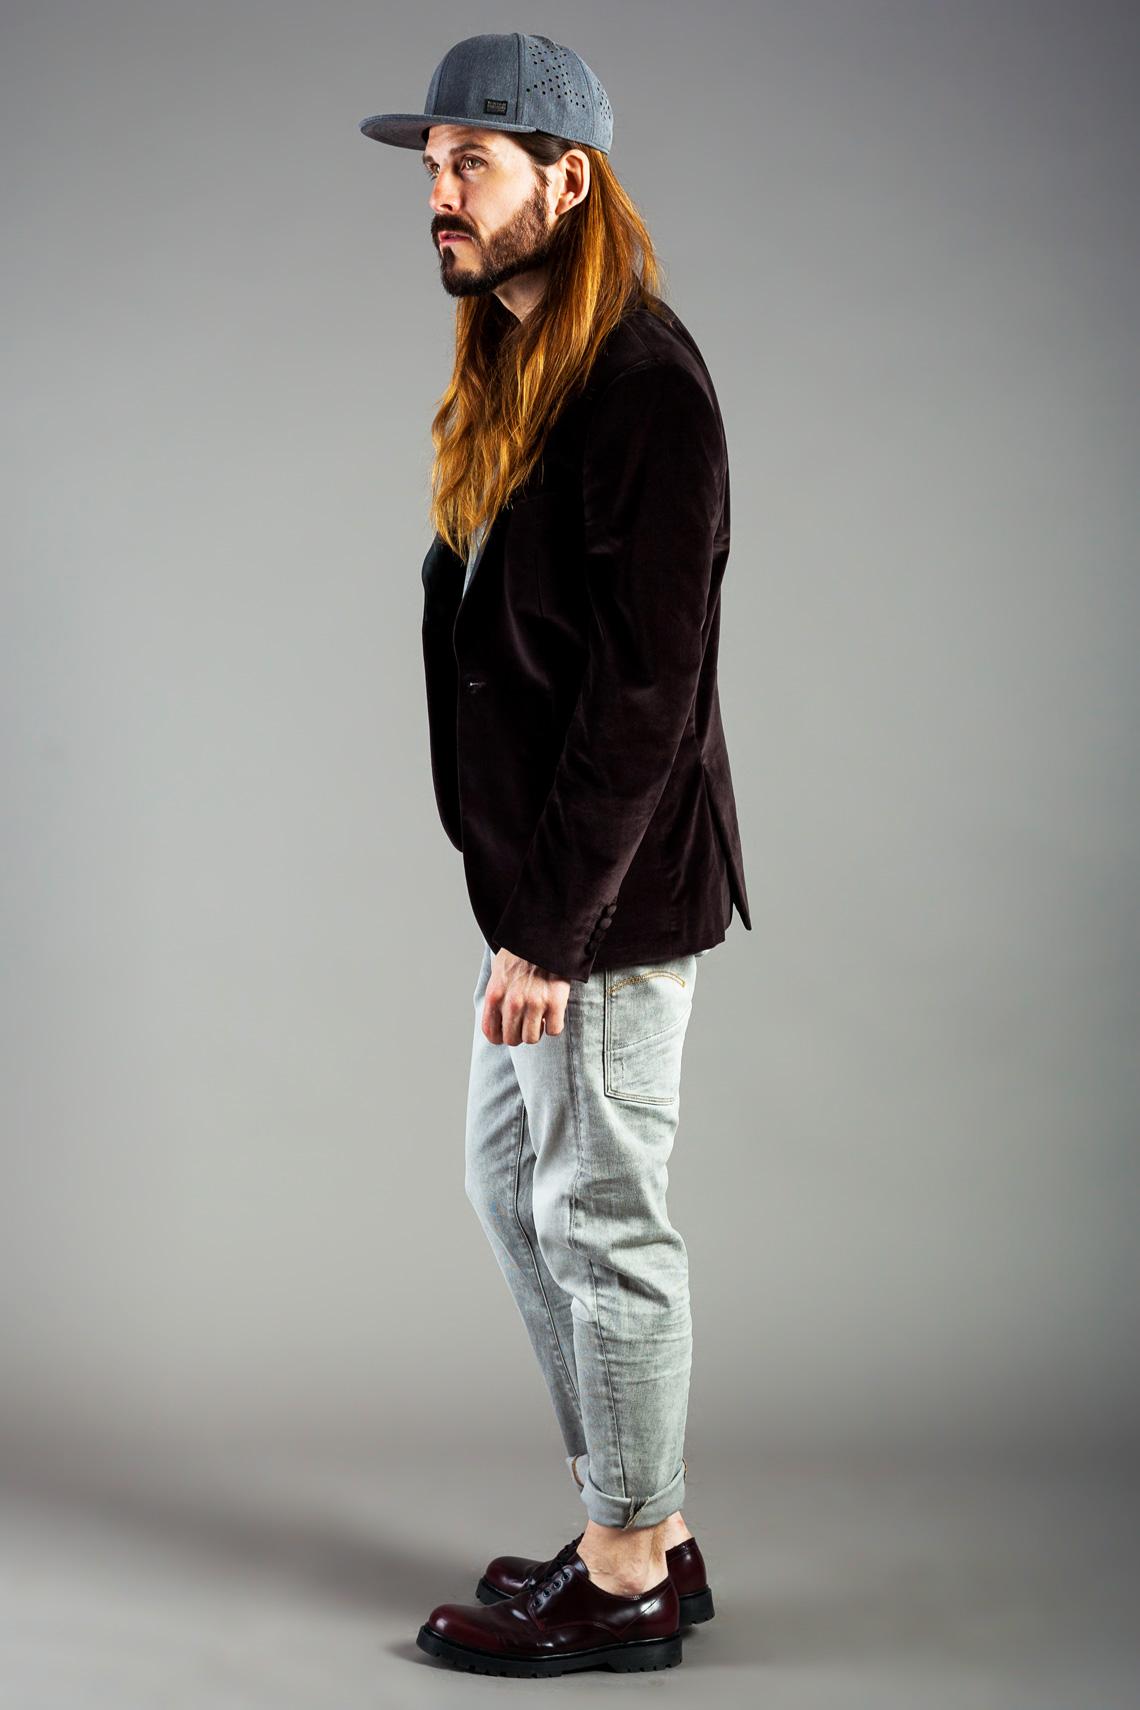 Kaisers-neue-Kleider_Männermodeblog_Fashion_Outfit_Trend_London-Style